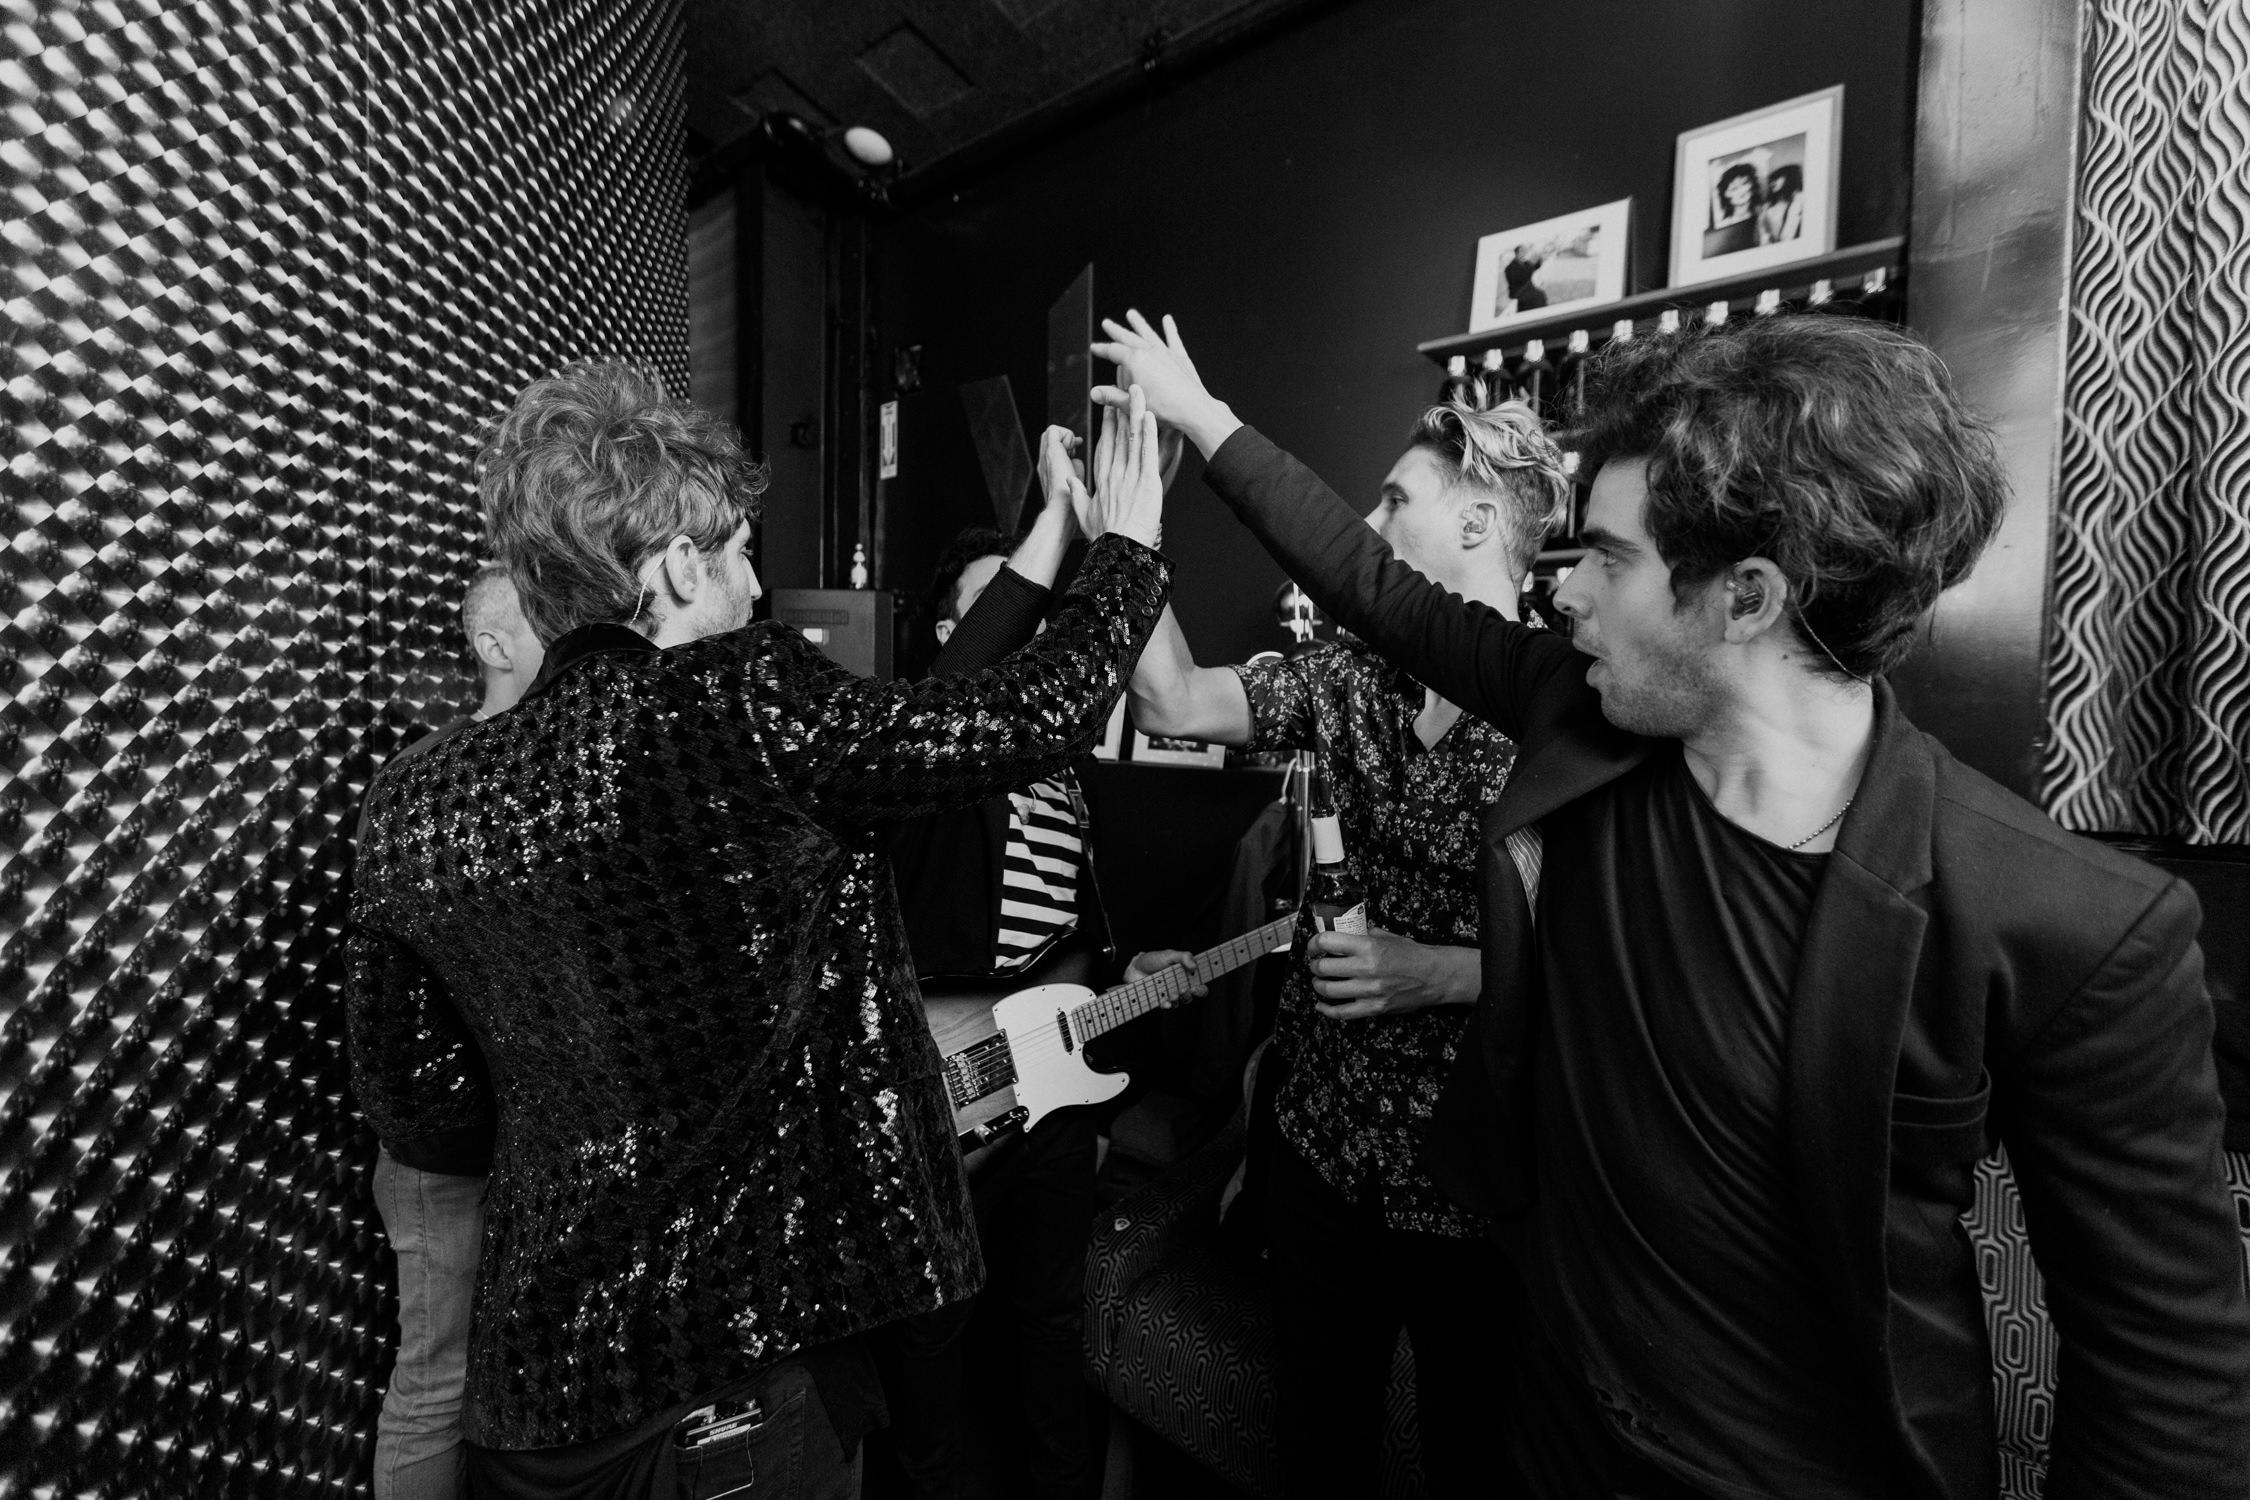 smallpools-tour-huddle-backstage-peppermint-club-los-angeles-AnnaLeeMedia